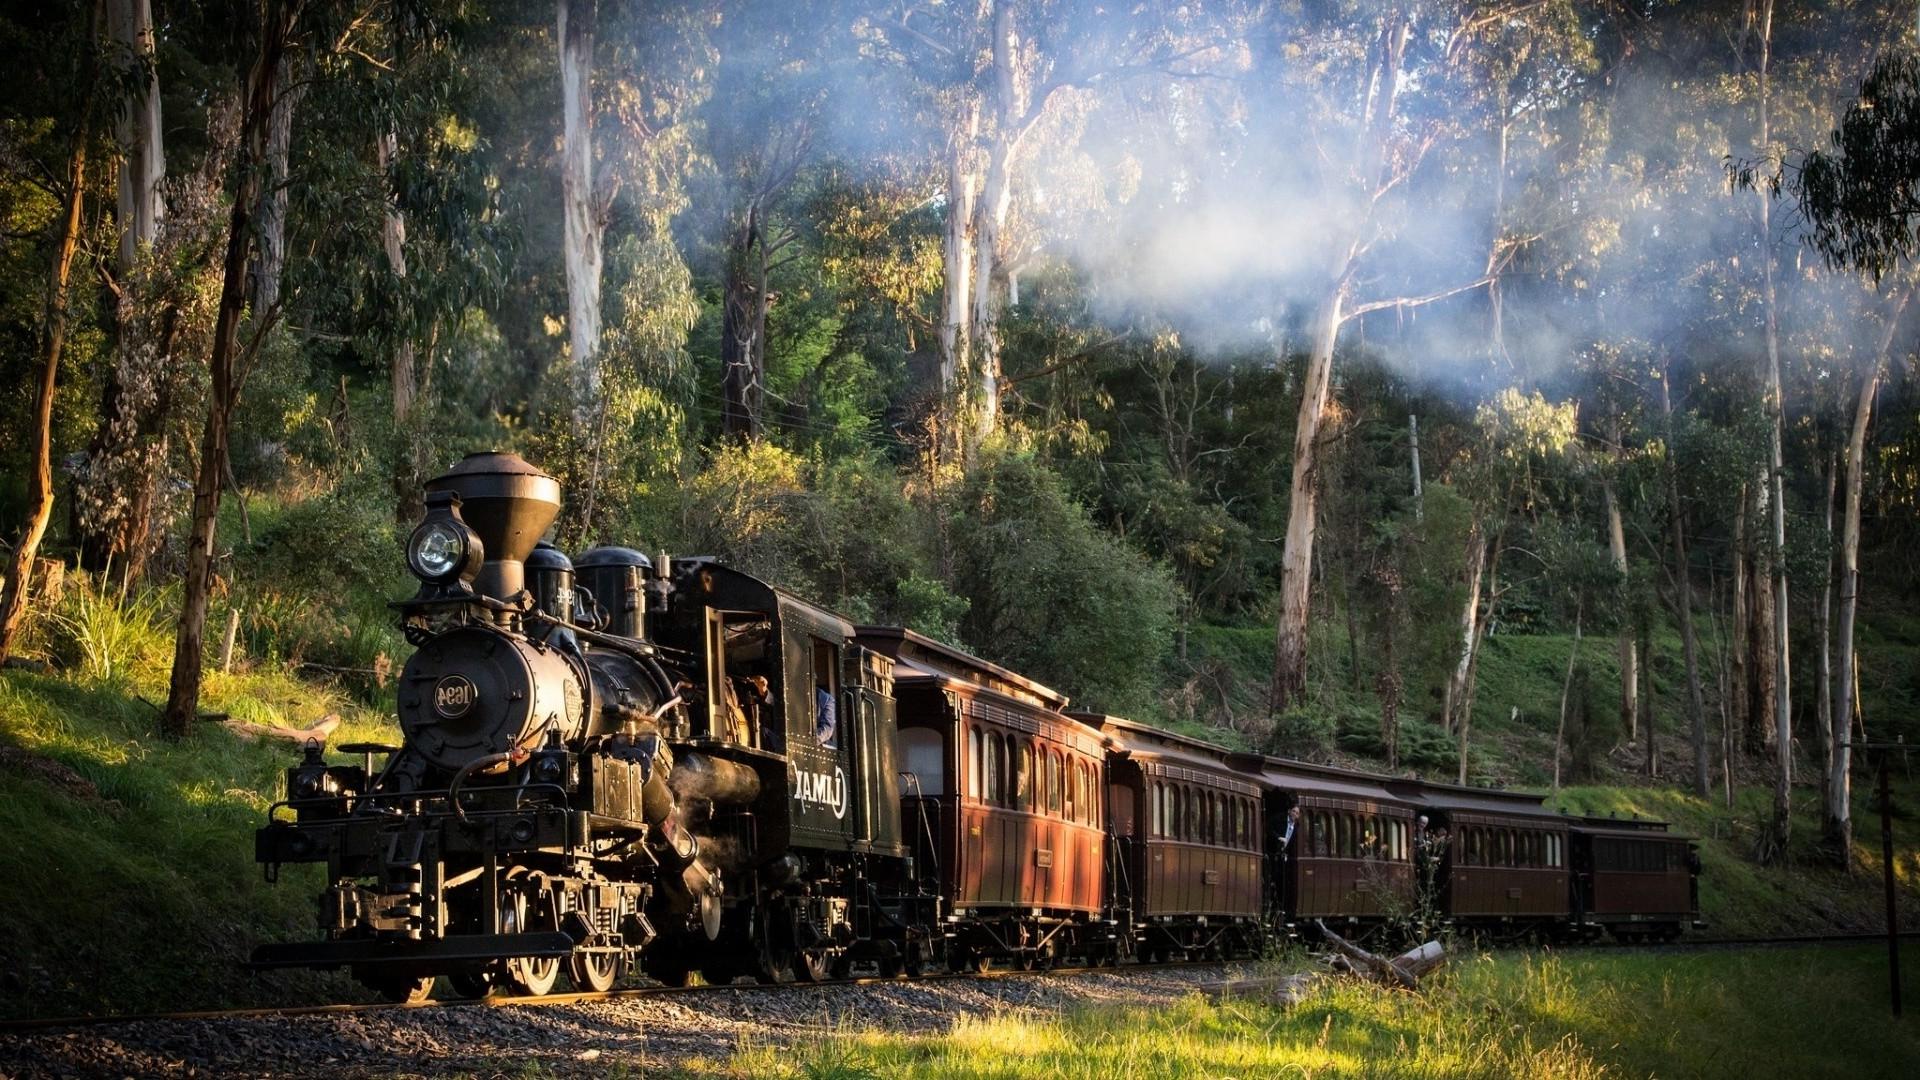 19 Fantastic Hd Locomotive Wallpapers